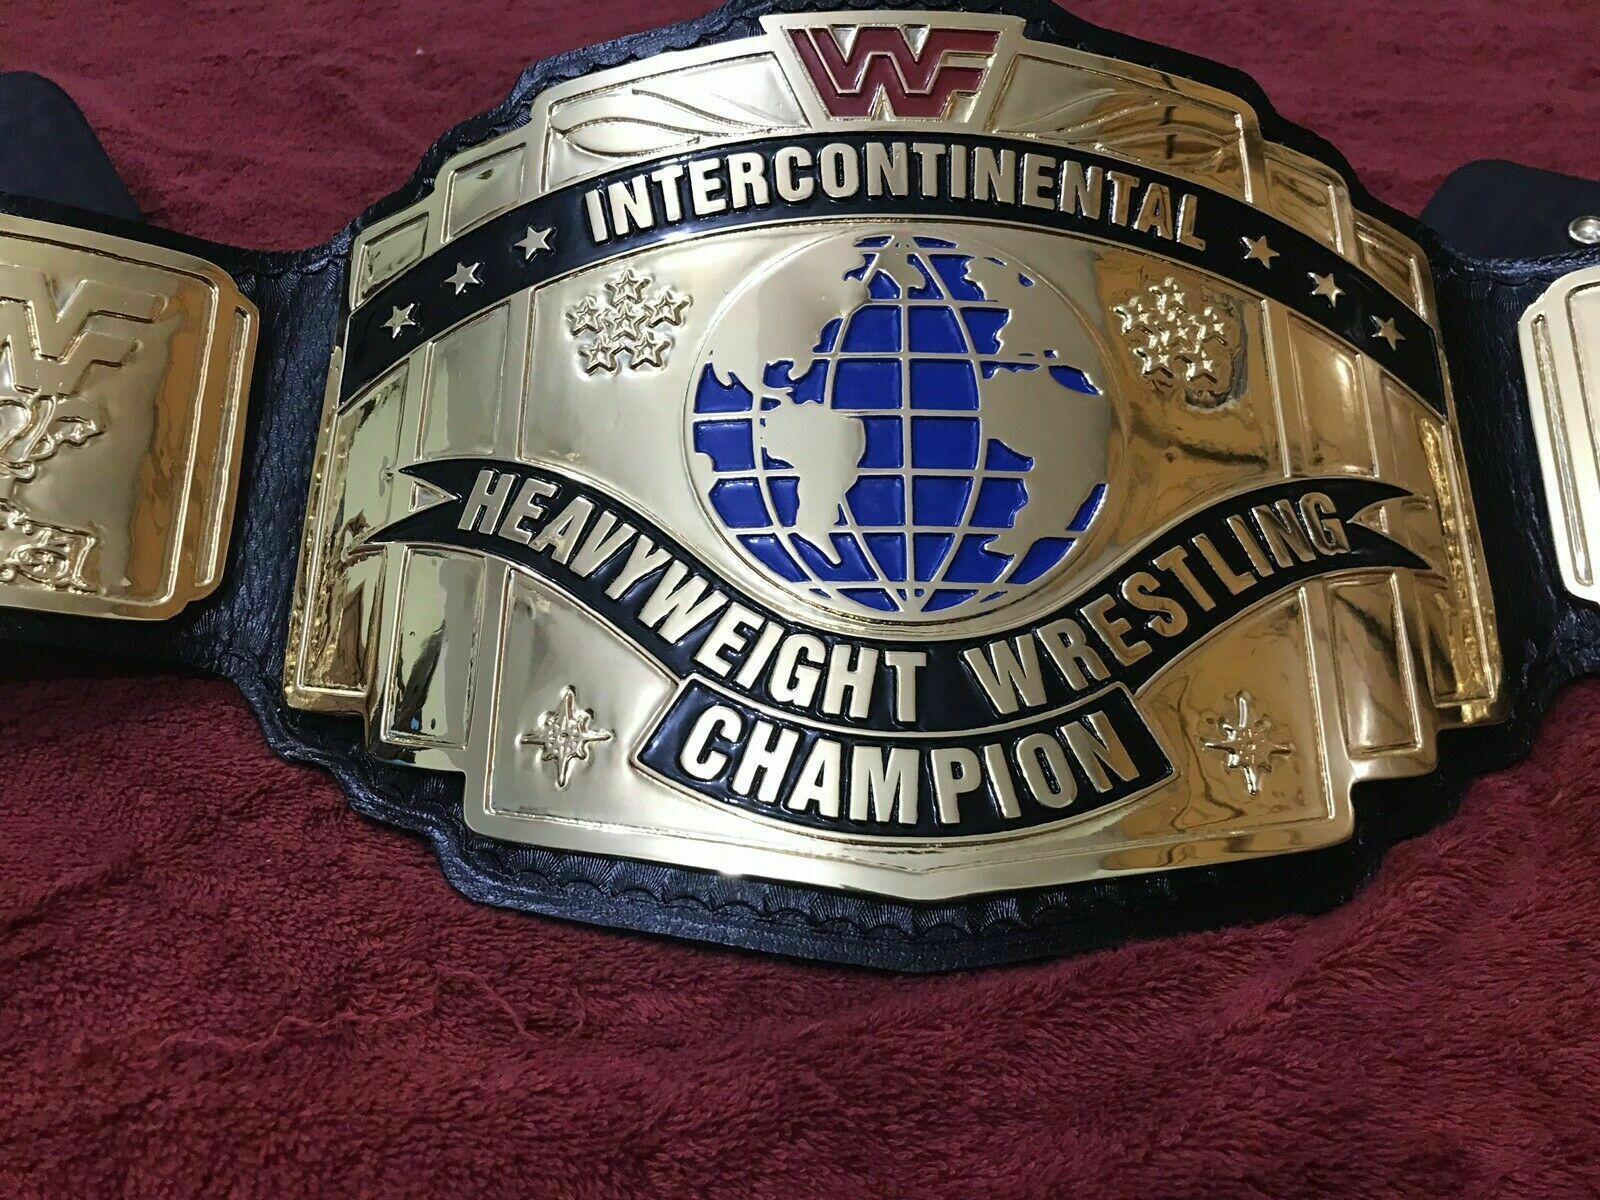 WWF Classic Intercontinental Championship Belt - $325